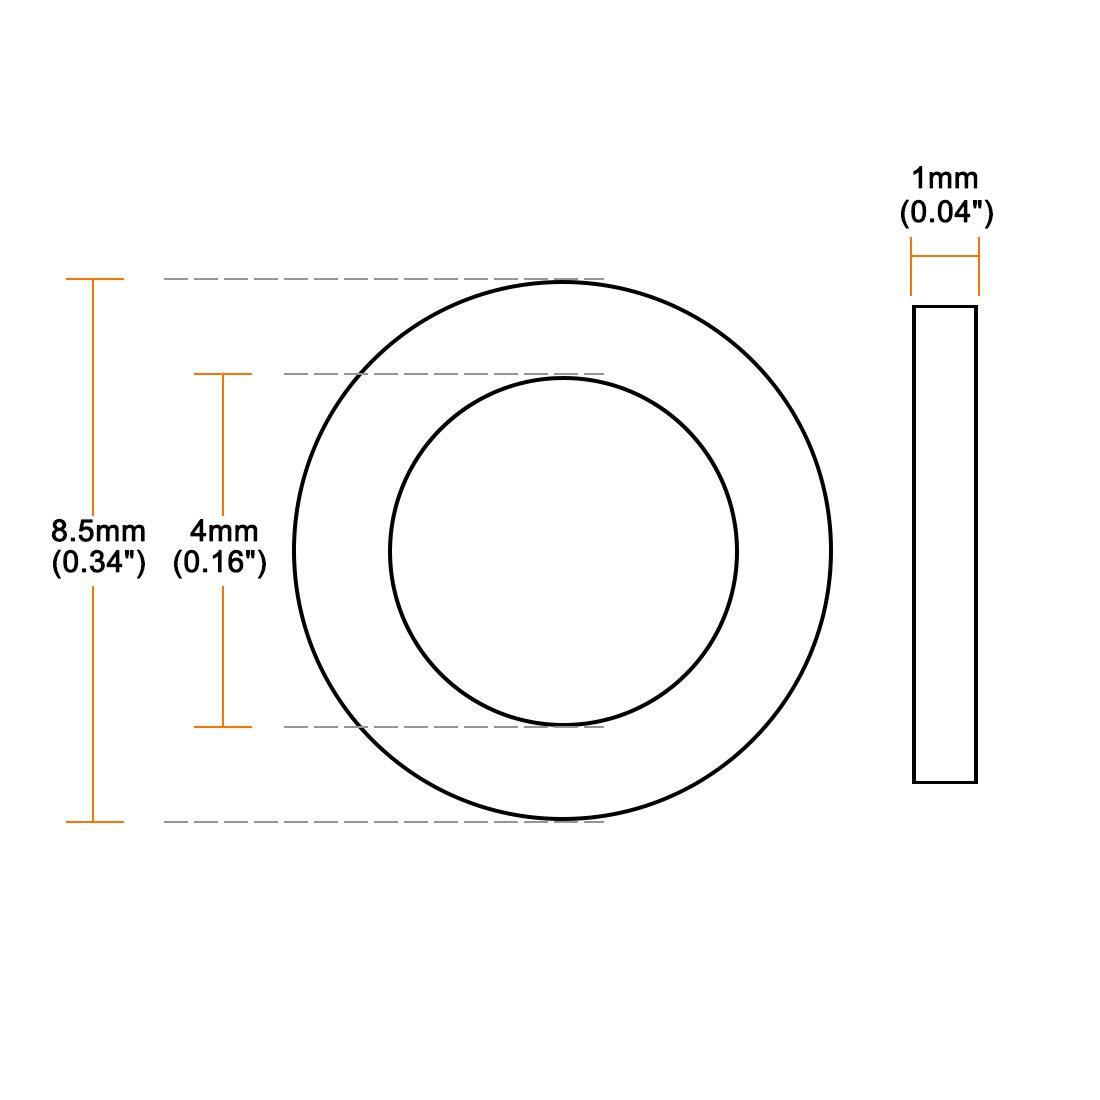 sourcing map arandelas planas de nylon para tornillo m18 tornillo 27mm od 1mm espesor claro 200pcs